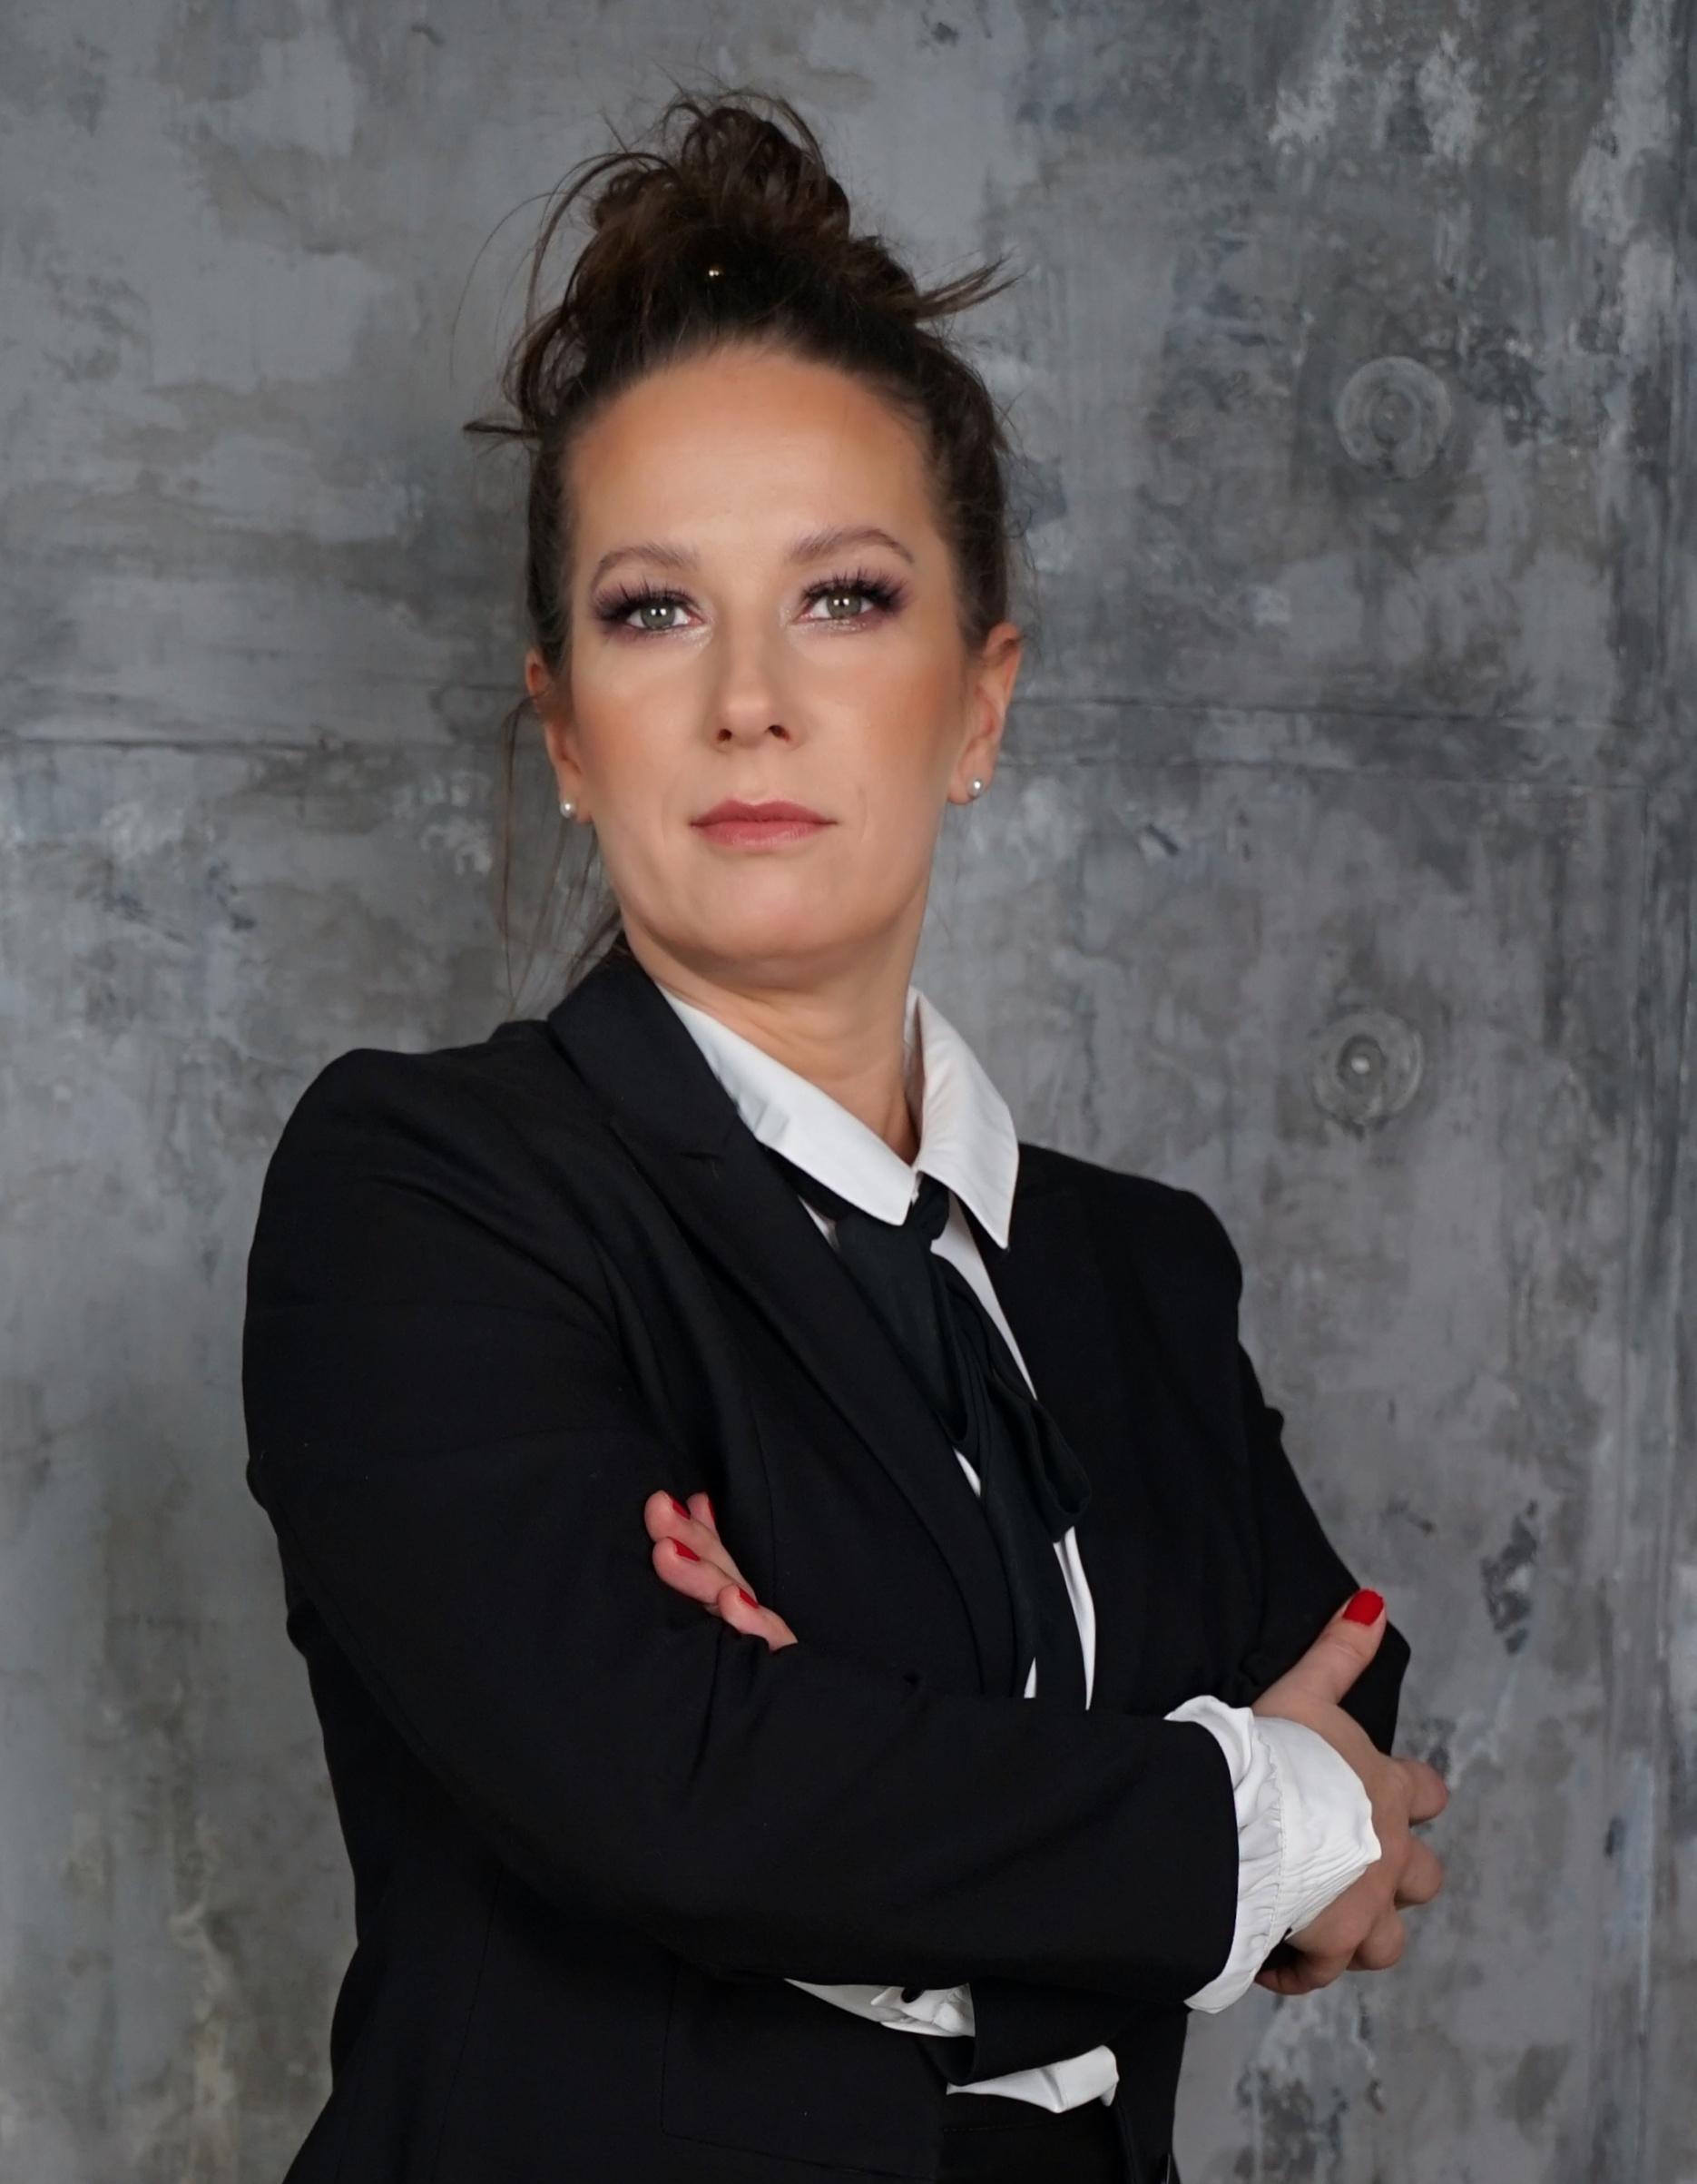 Joanna Porath